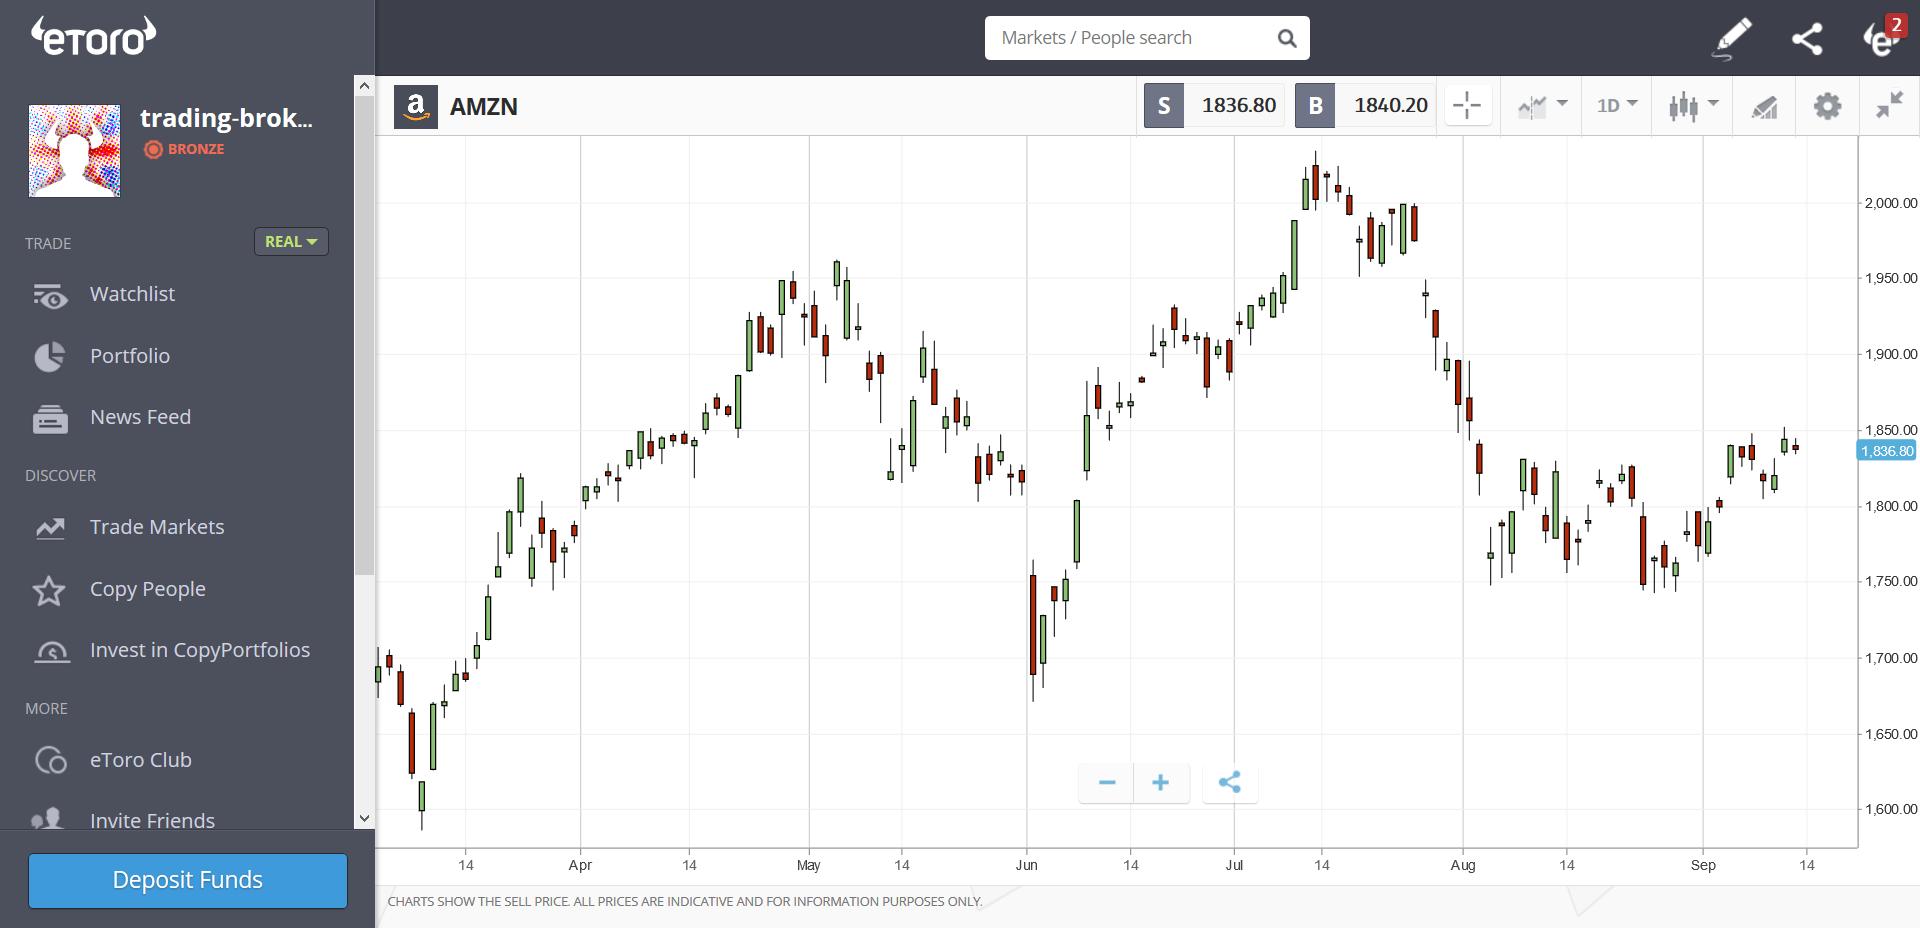 Free binary options charts etoro free binary options indicators for mt4 brokers